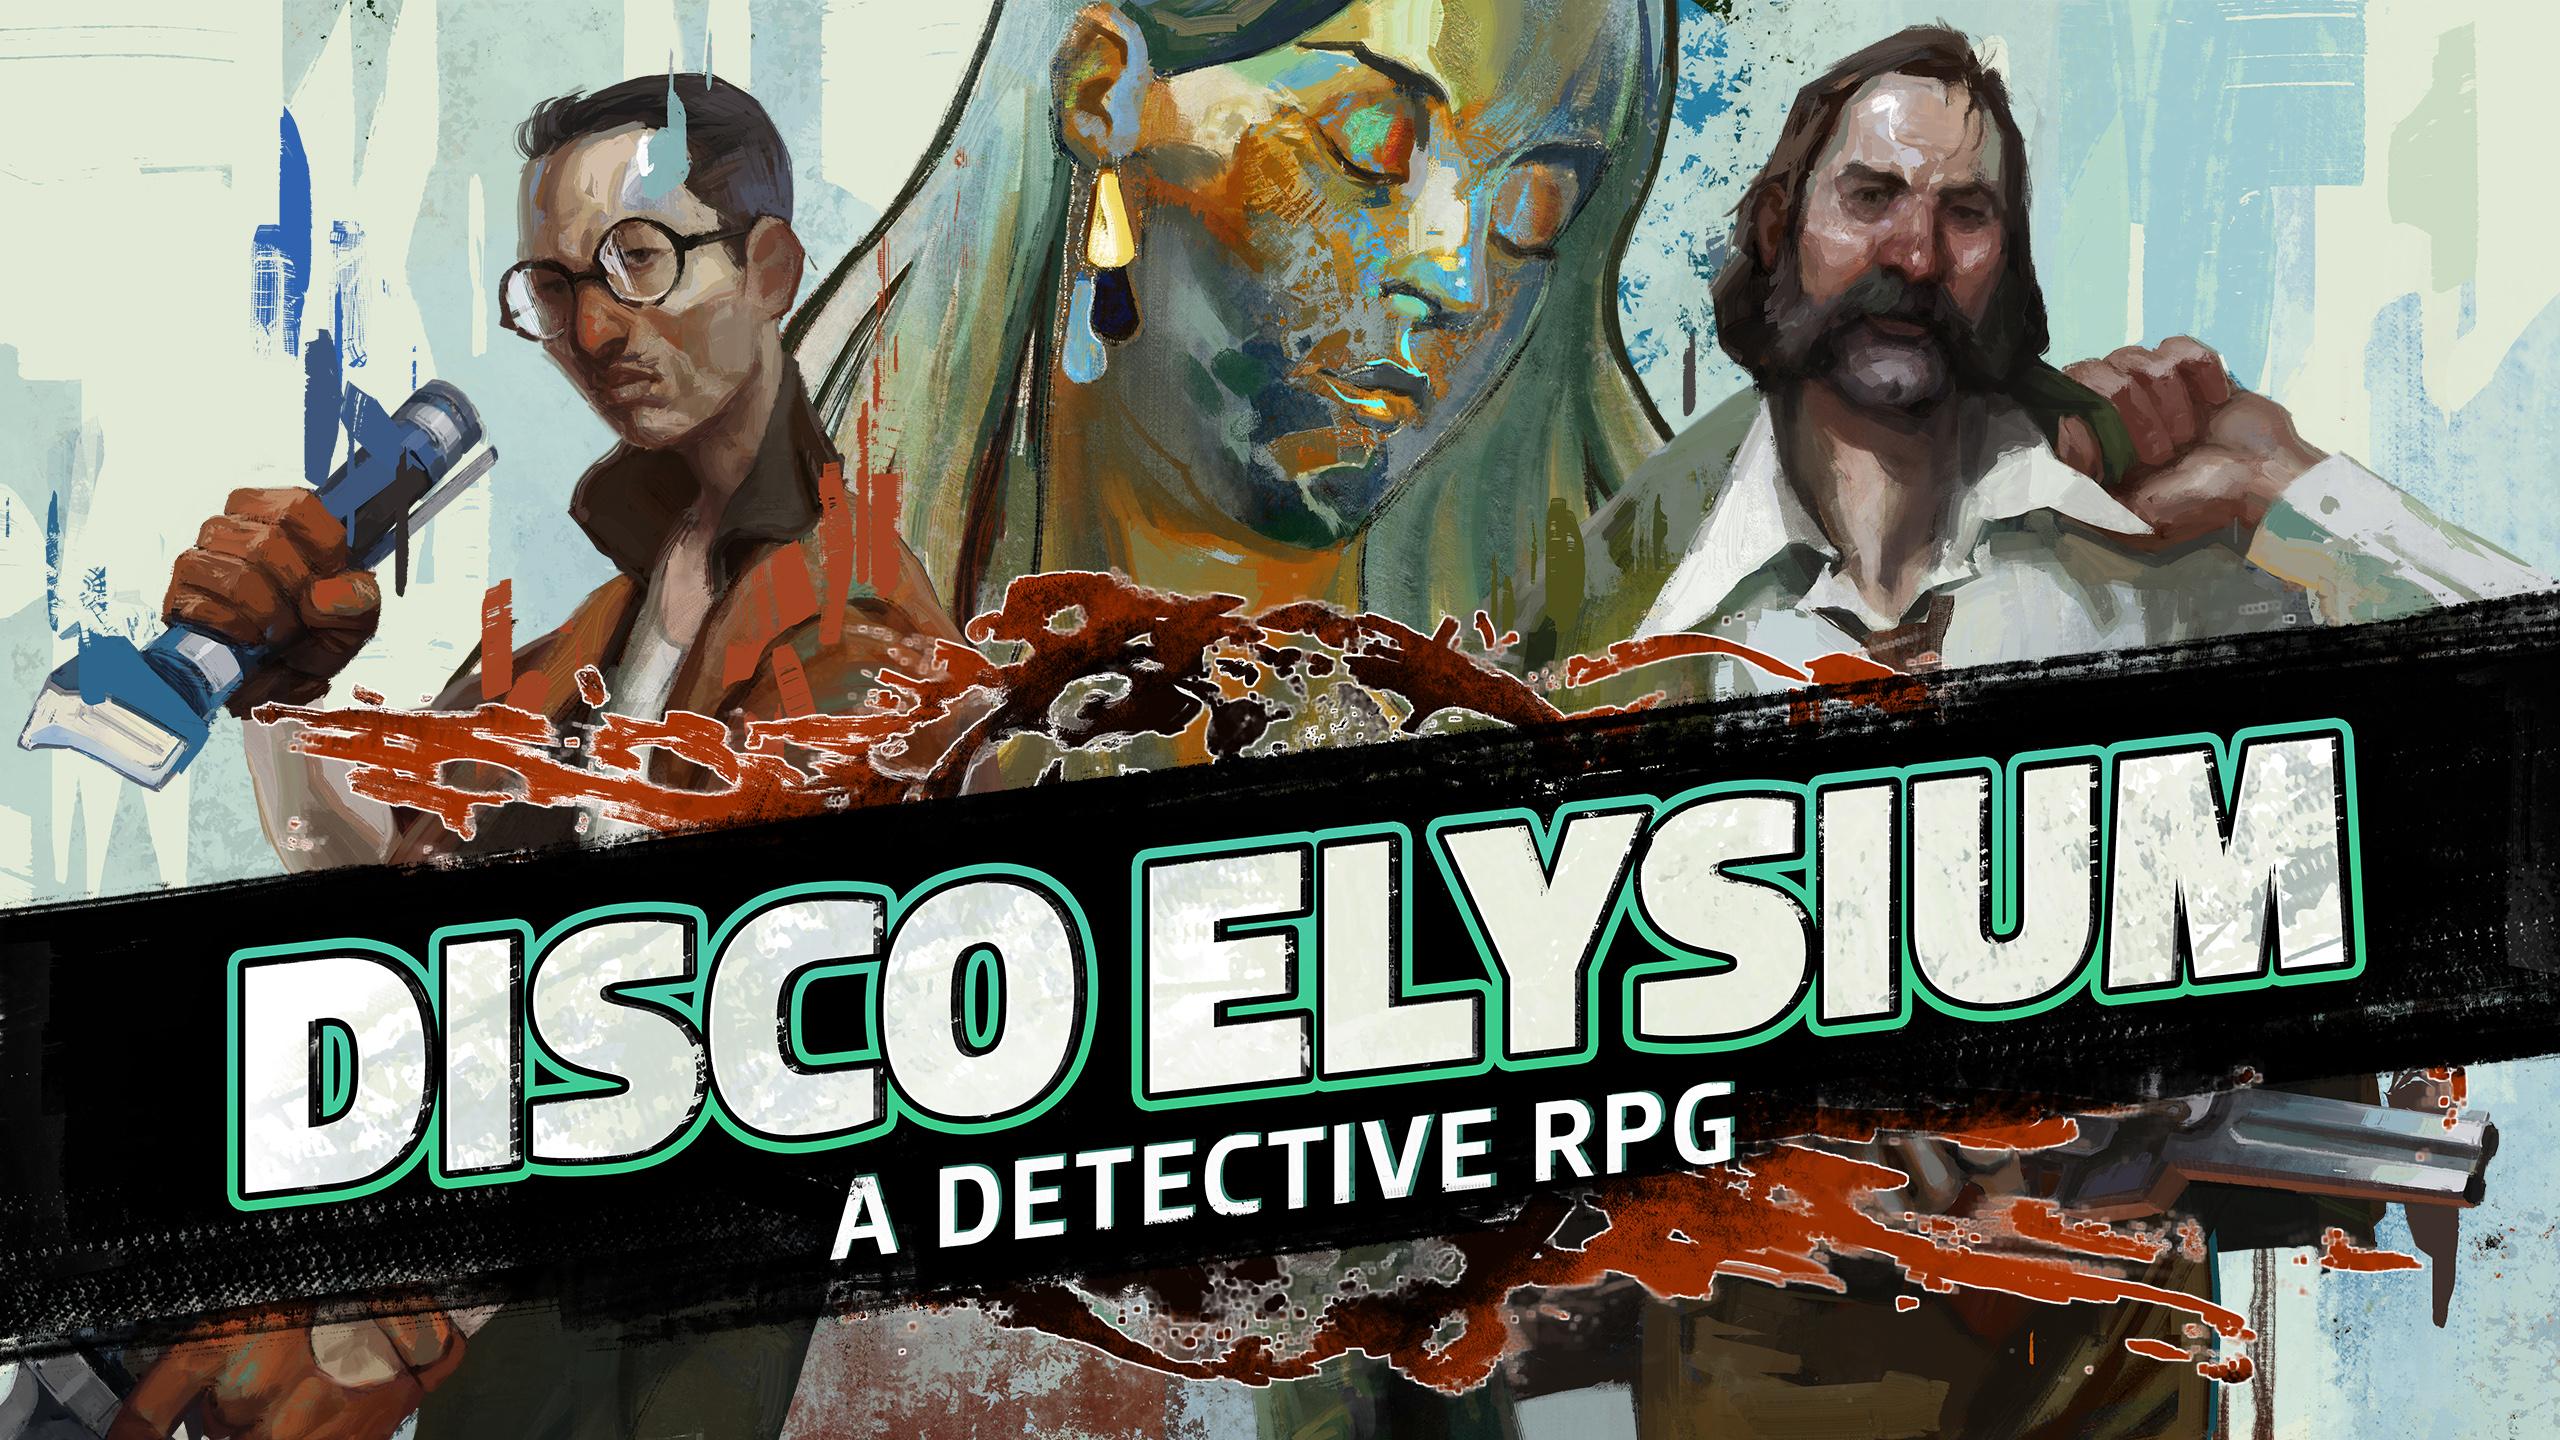 disco elysium video game background wallpaper 69133